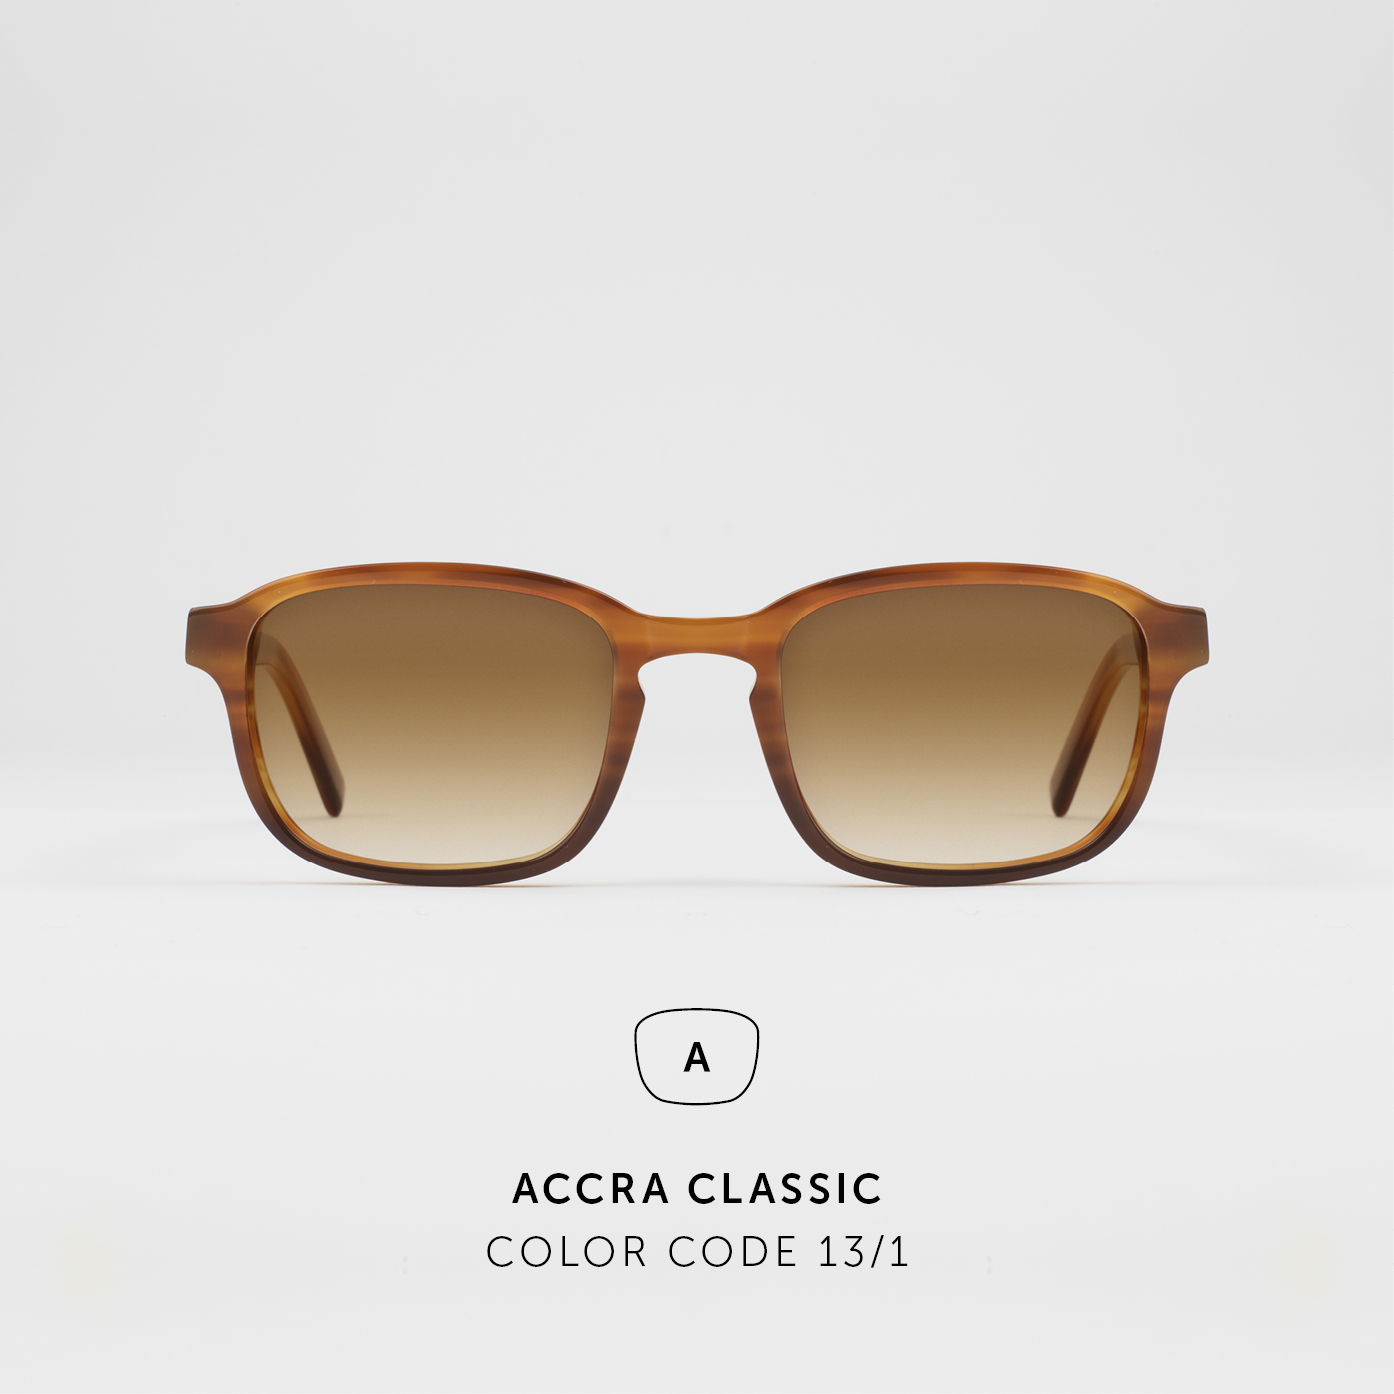 AccraClassic47.jpg